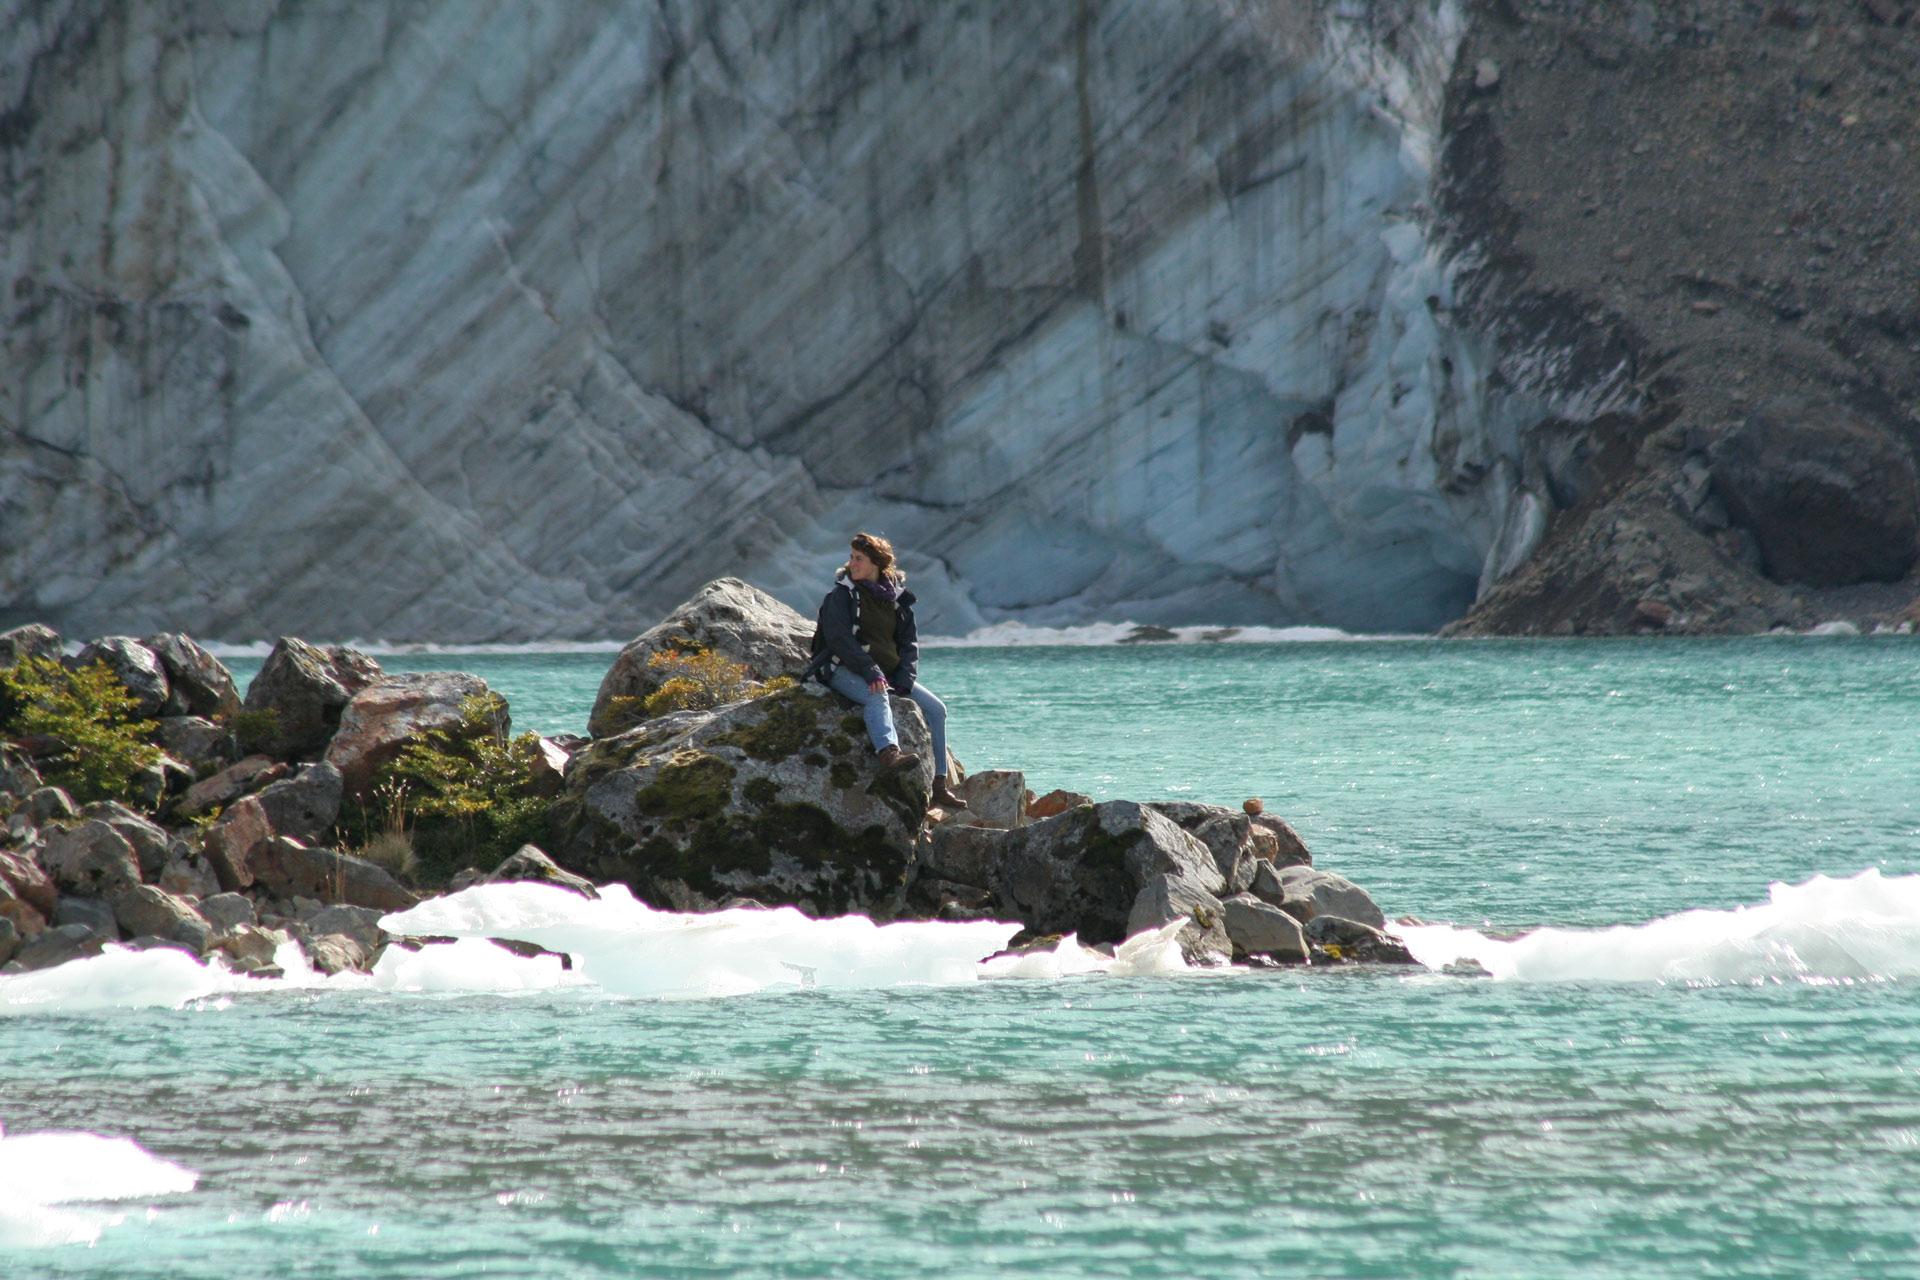 Glaciar Torrecillas - Trevelin